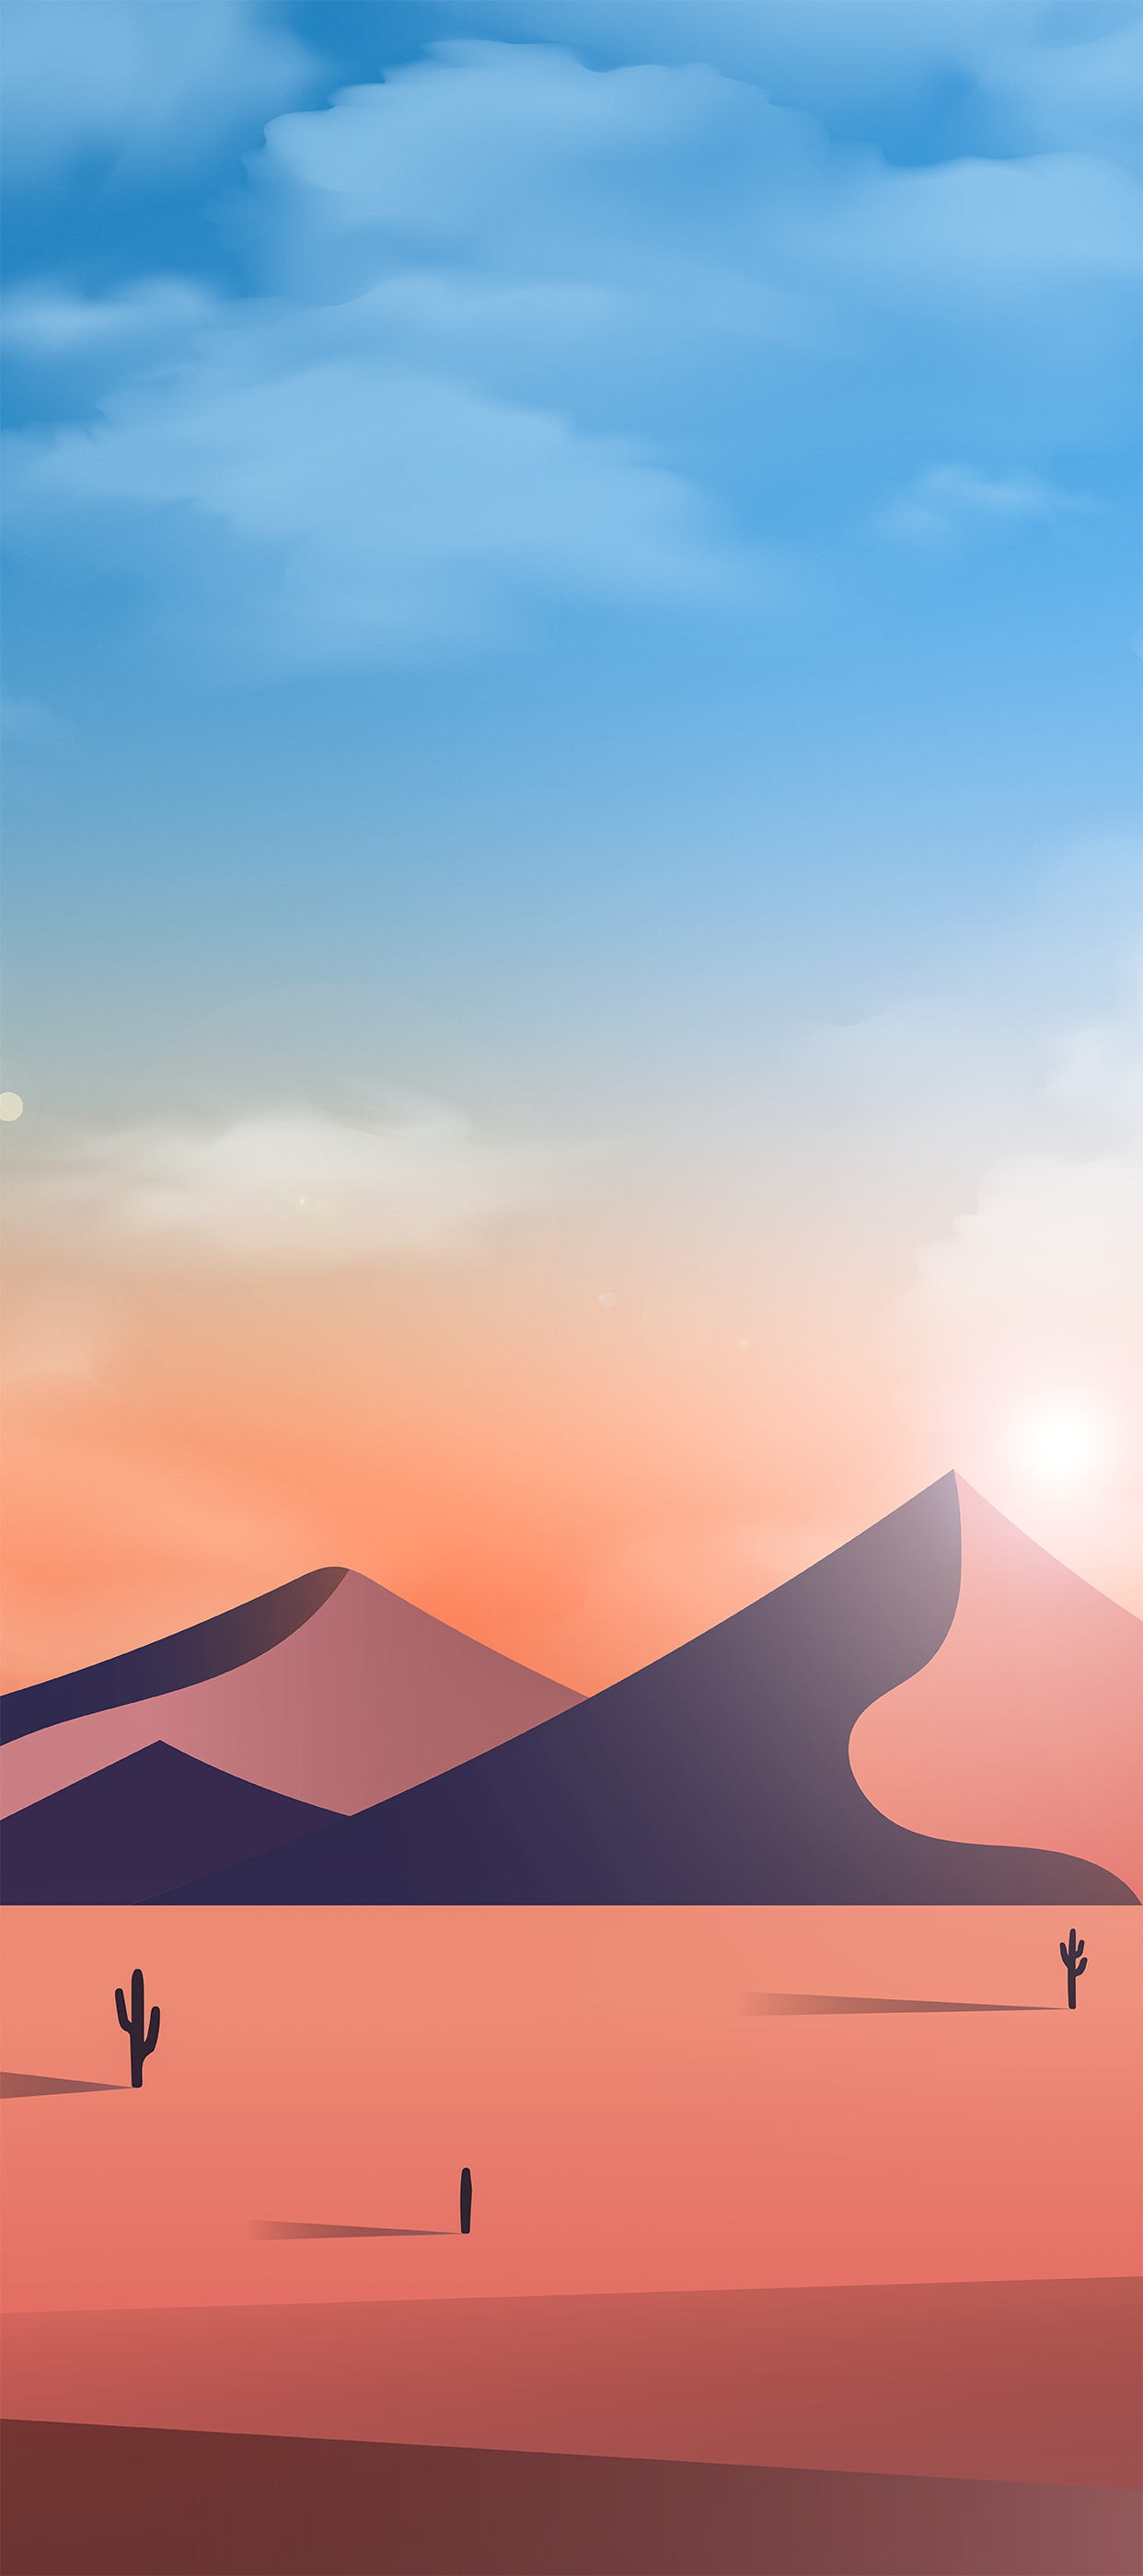 Sunset Desert by @EvgeniyZemelko